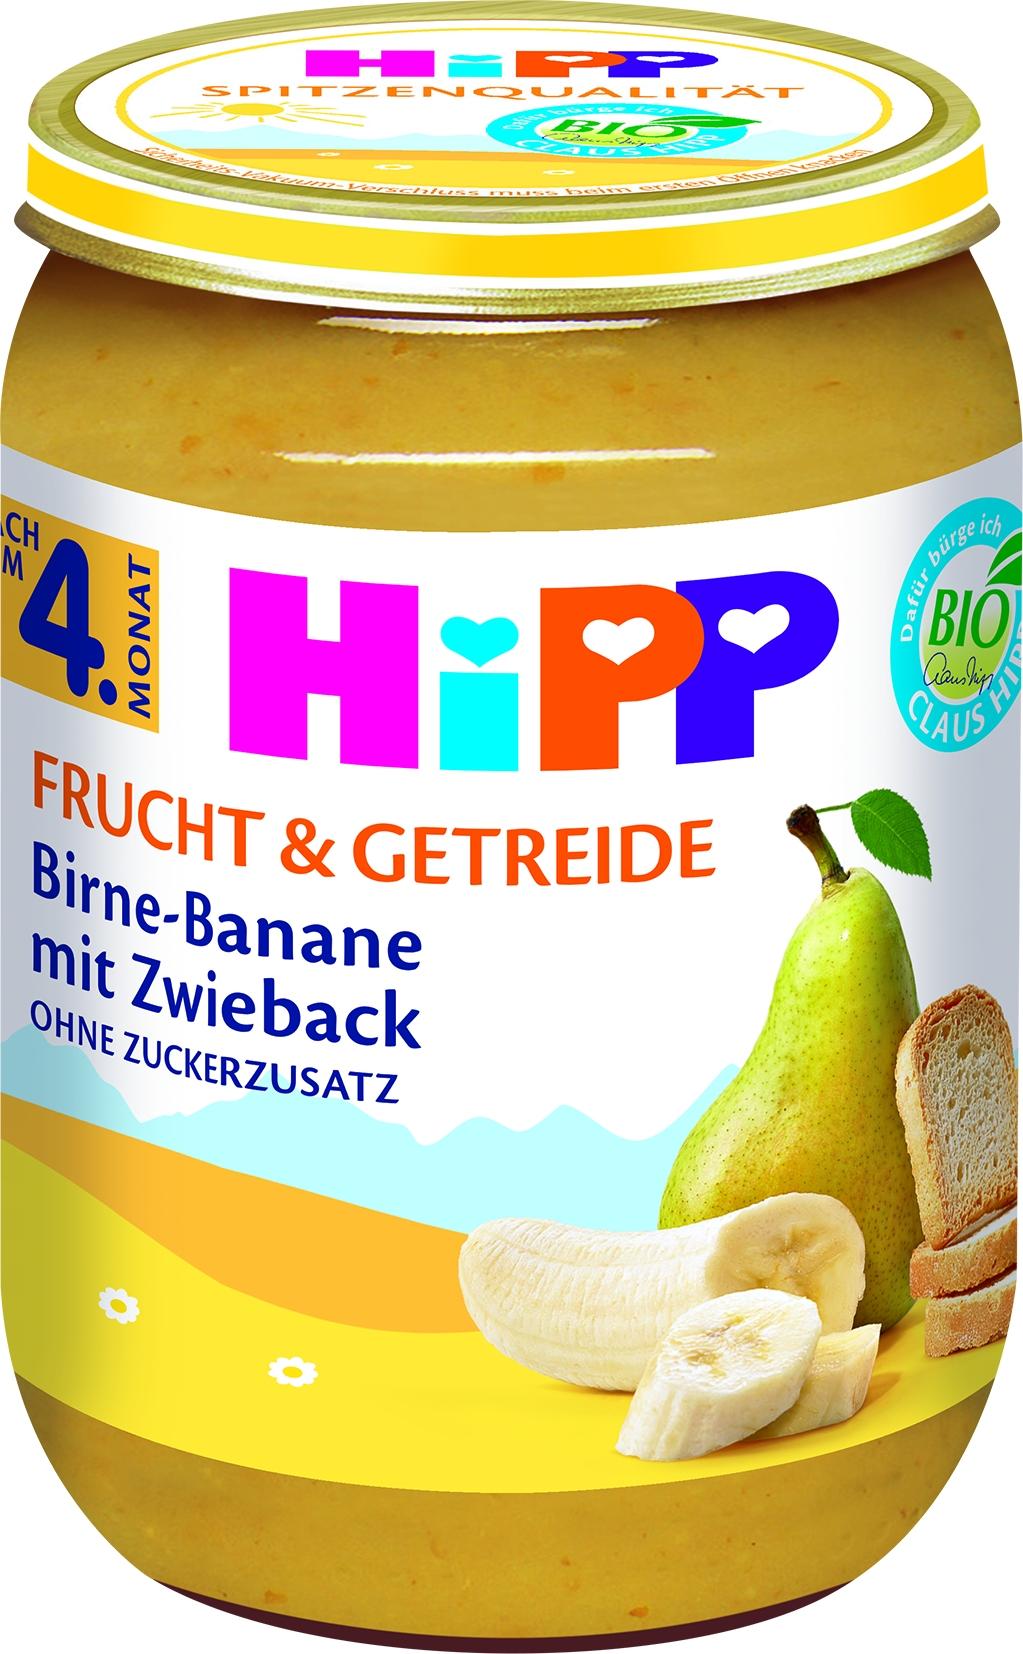 Bio 4735-01 Birne/Banane/Zwieback